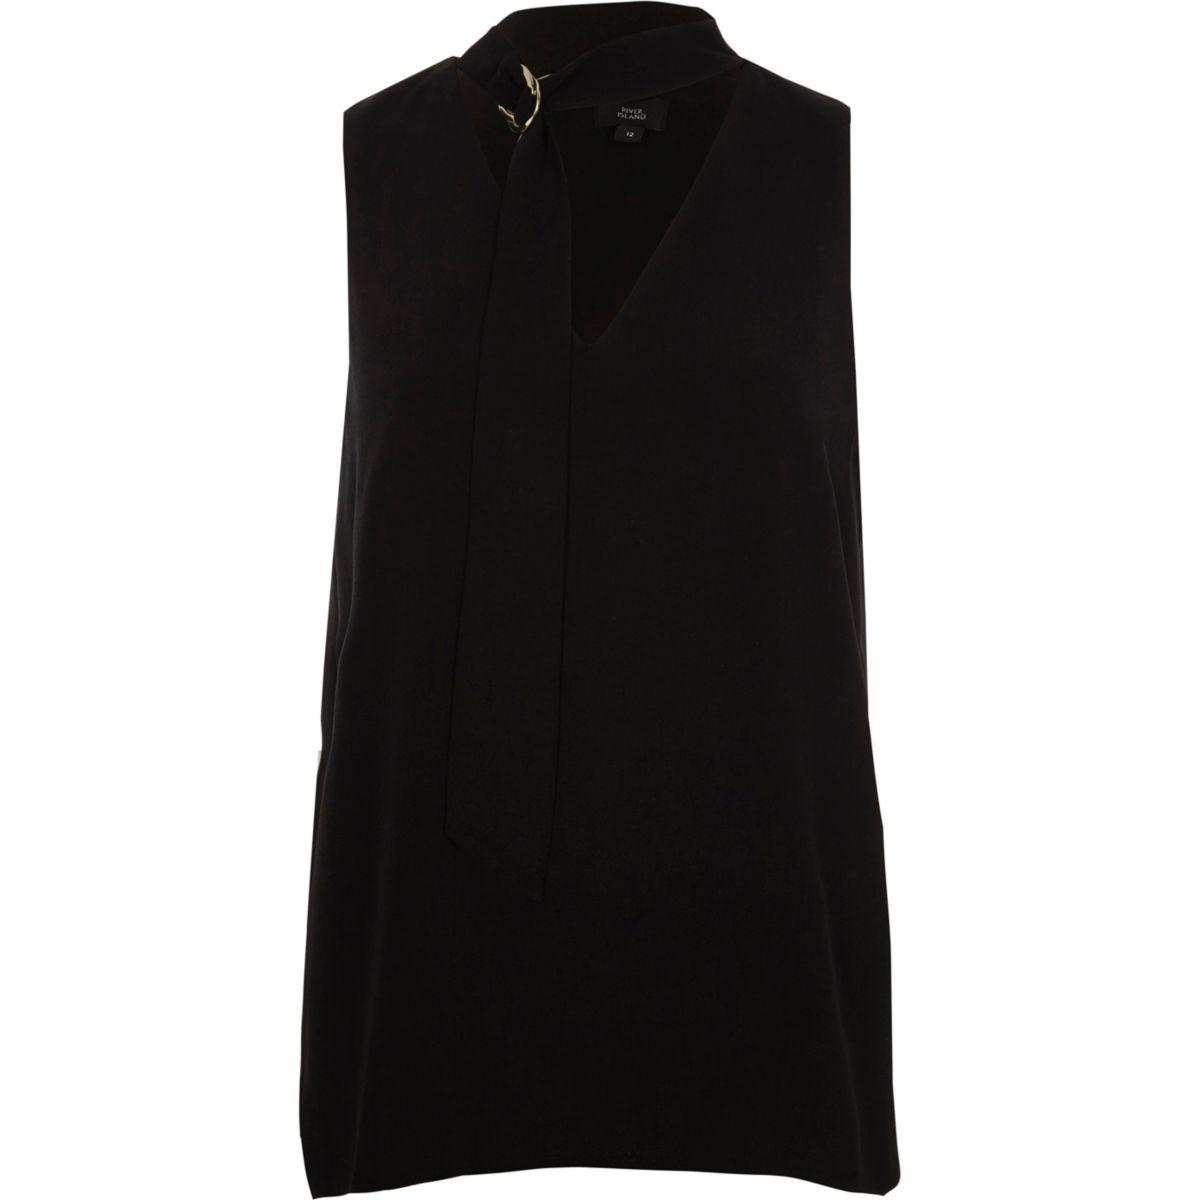 Black D ring choker sleeveless top